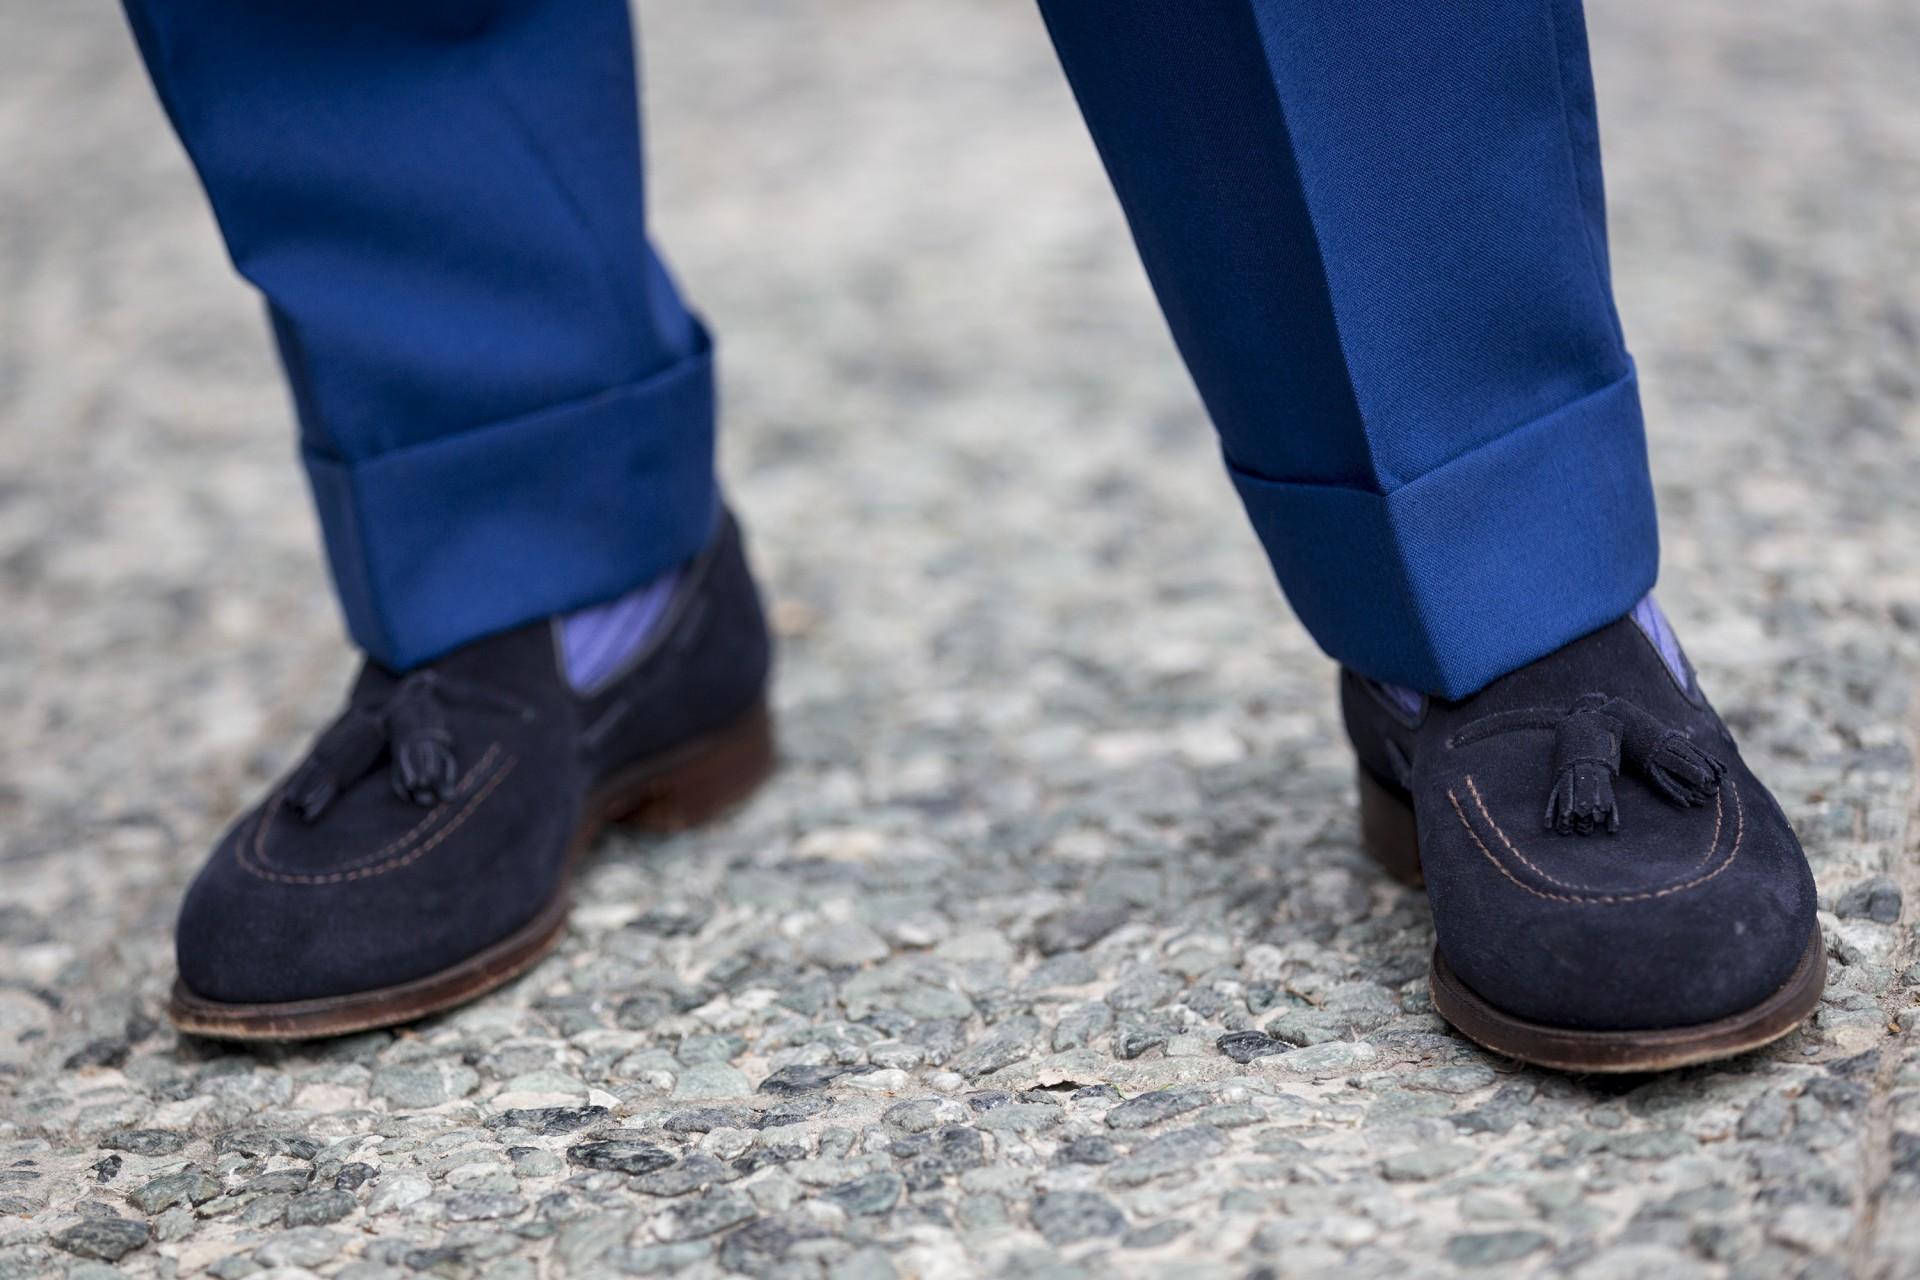 Pitti Uomo 90 Shoe Portraits